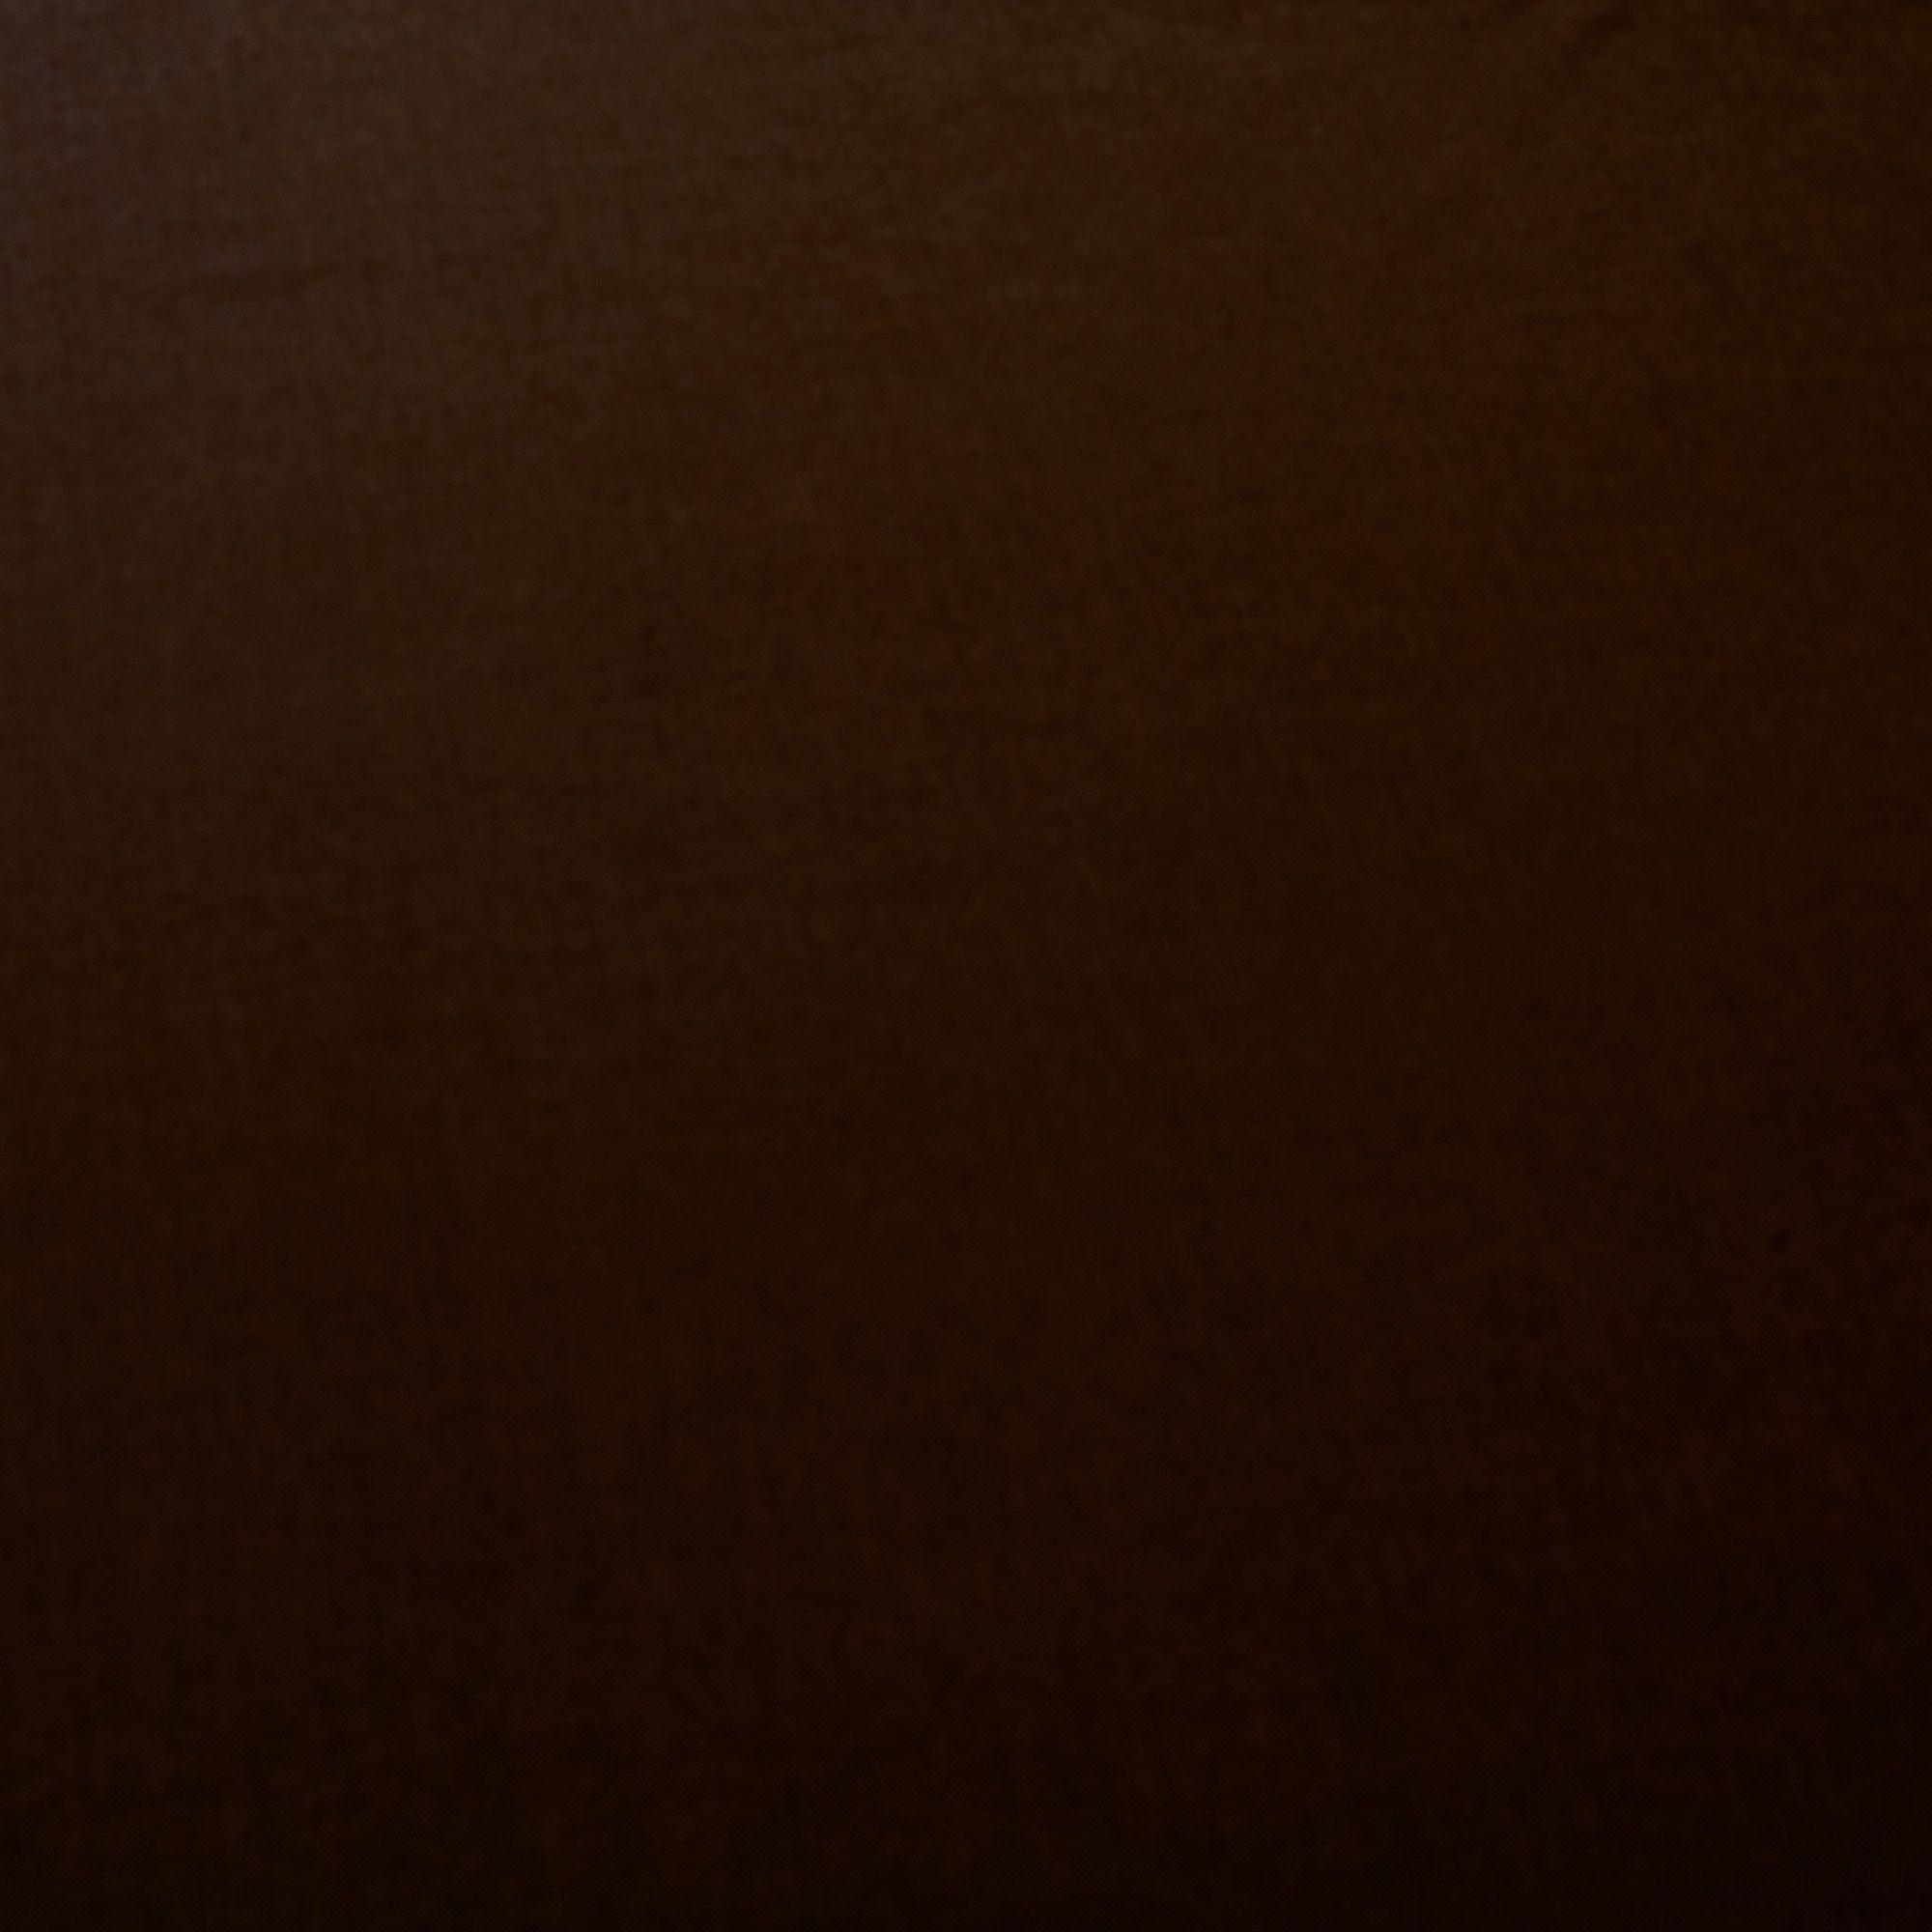 Tecido Bengaline Marrom Liso 1,45 Mt Largura